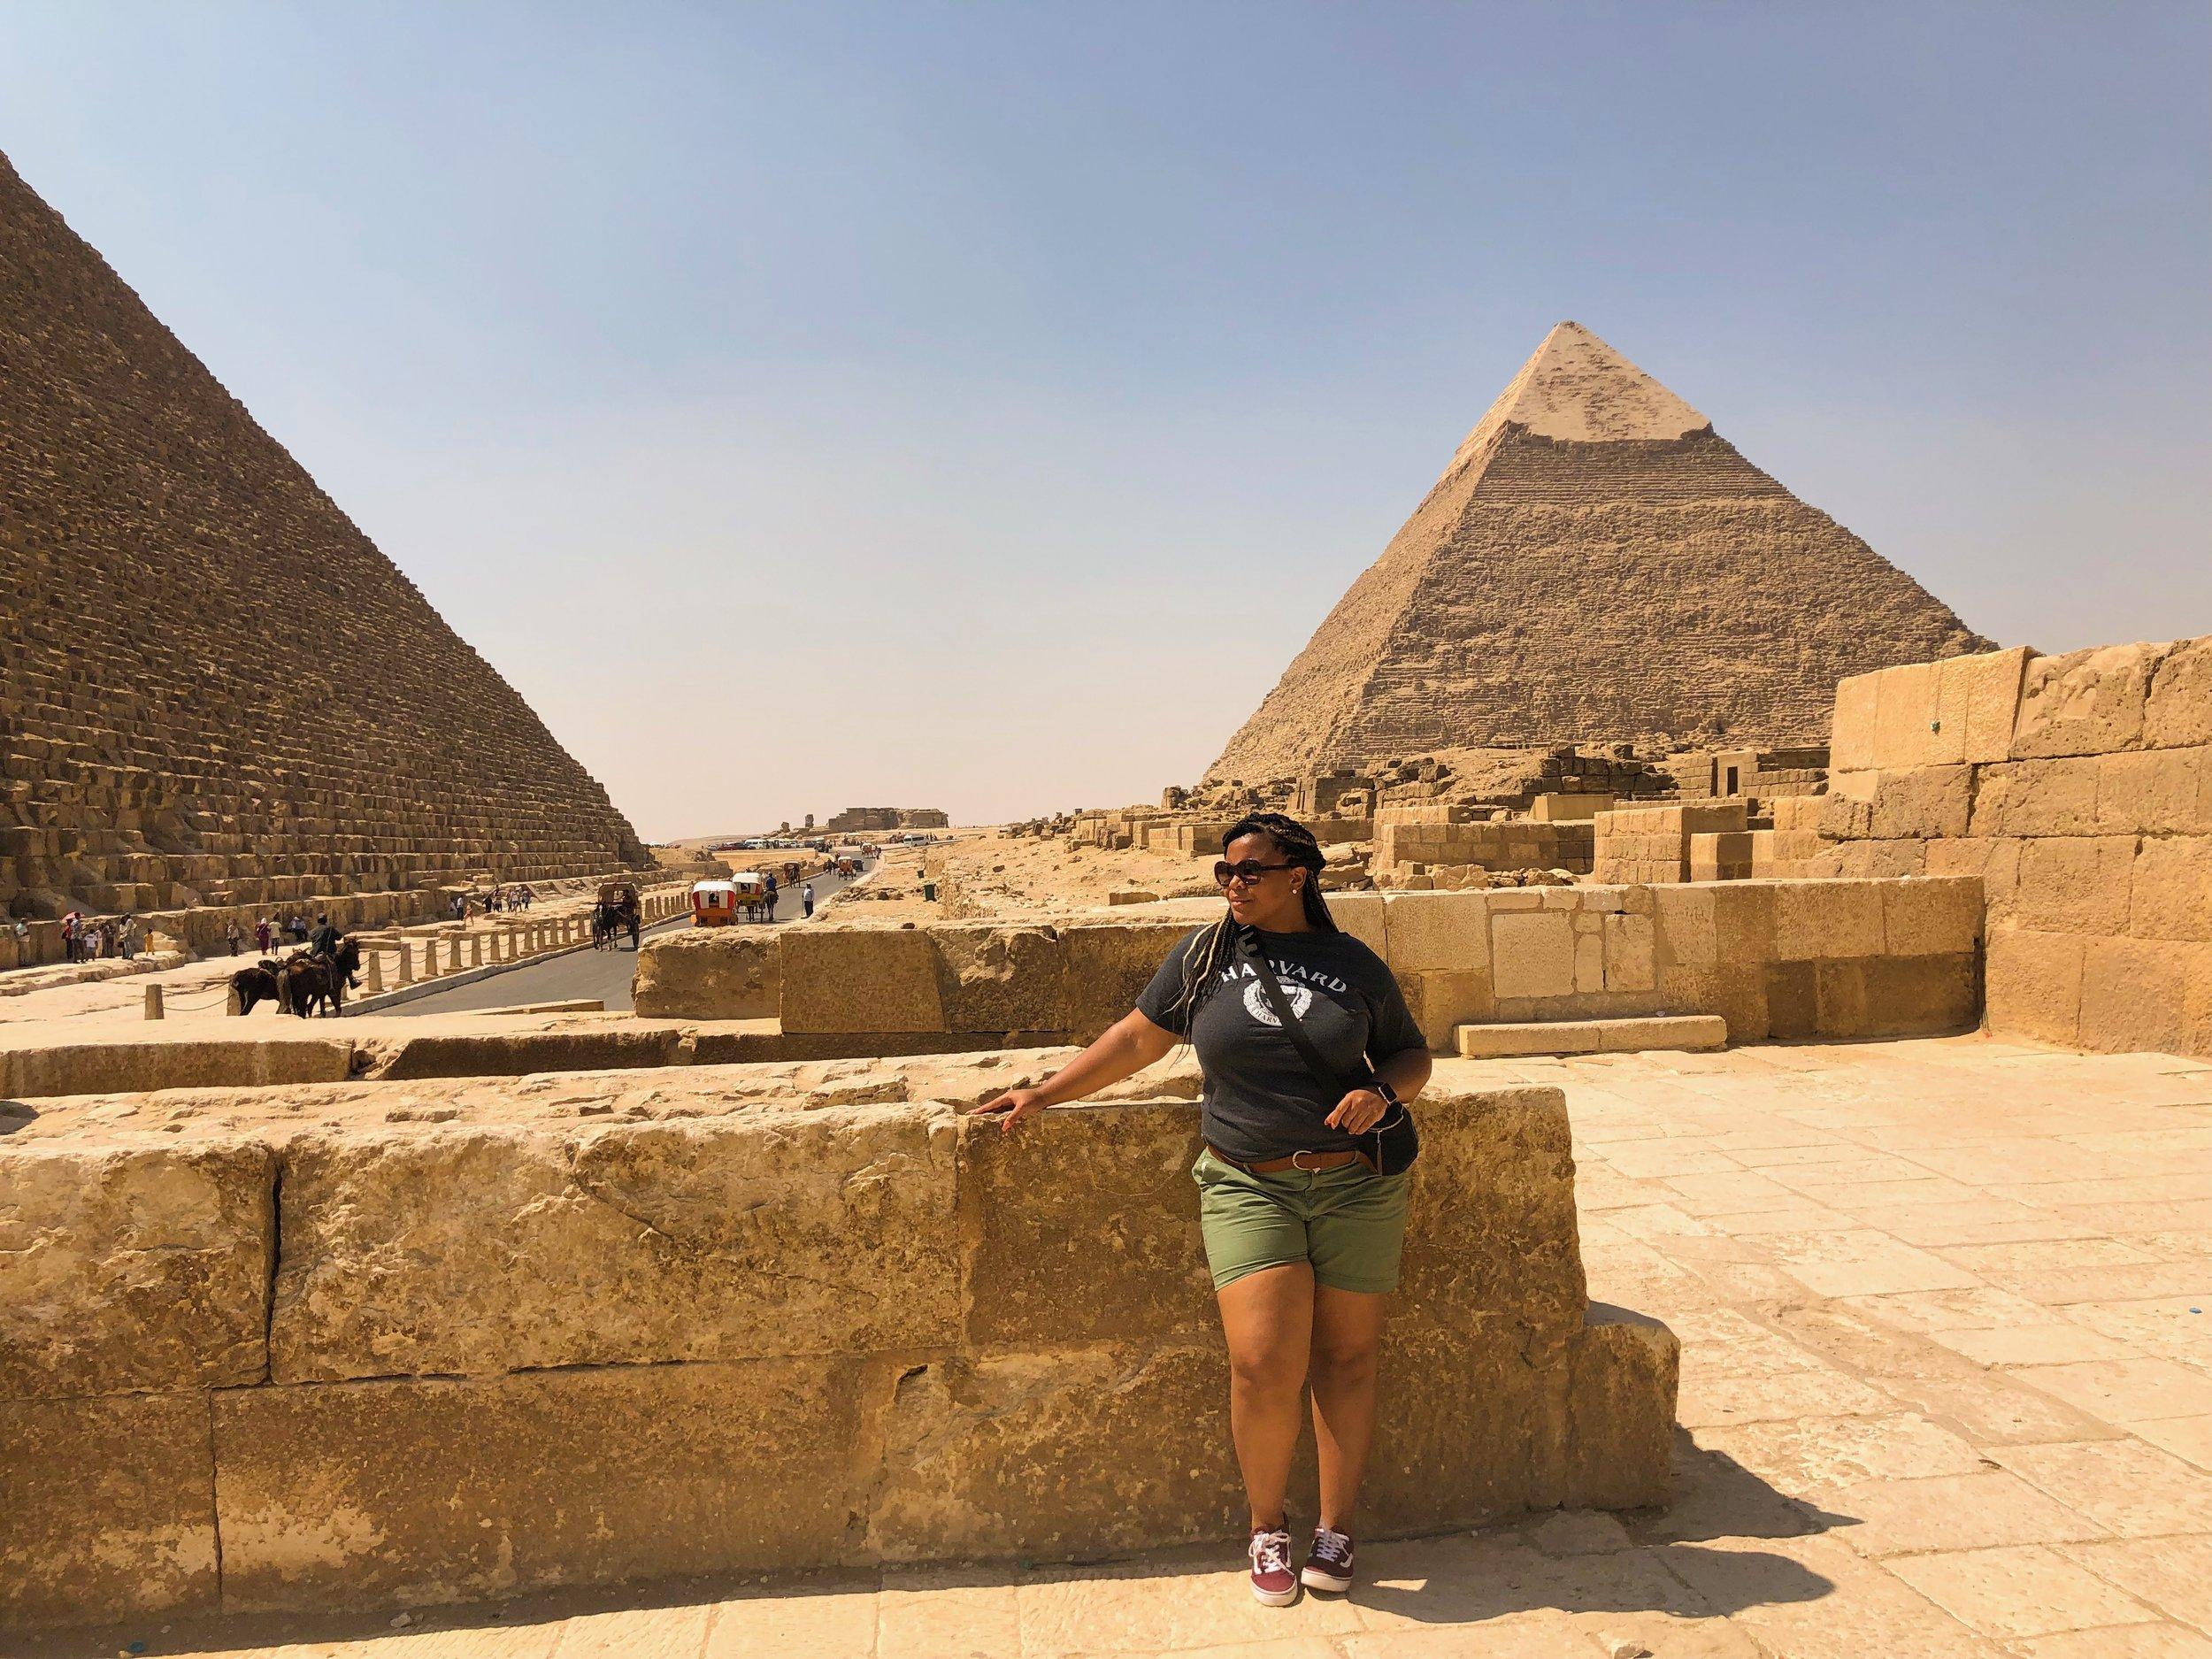 Jt's Travel 411: - Egypt edition